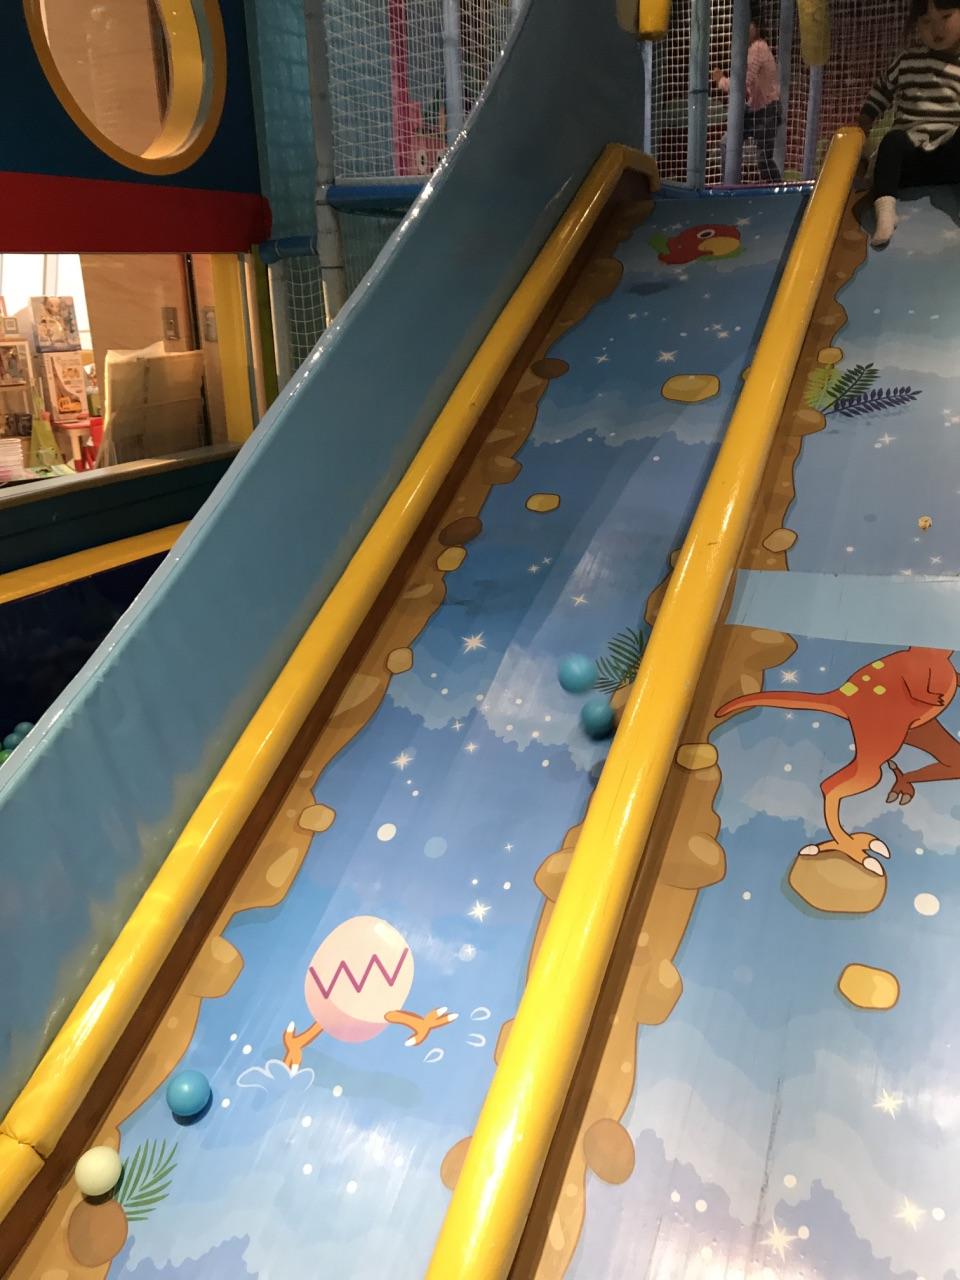 childrens play kitchen blue sink 携程攻略 上海巧虎欢乐岛儿童乐园 近铁店 景点 非常棒的乐园 非常 非常有意思的游乐设施 类似于科技馆 diy小厨房 很干净 人也不多 还有巧虎互动 孩子玩的非常开心